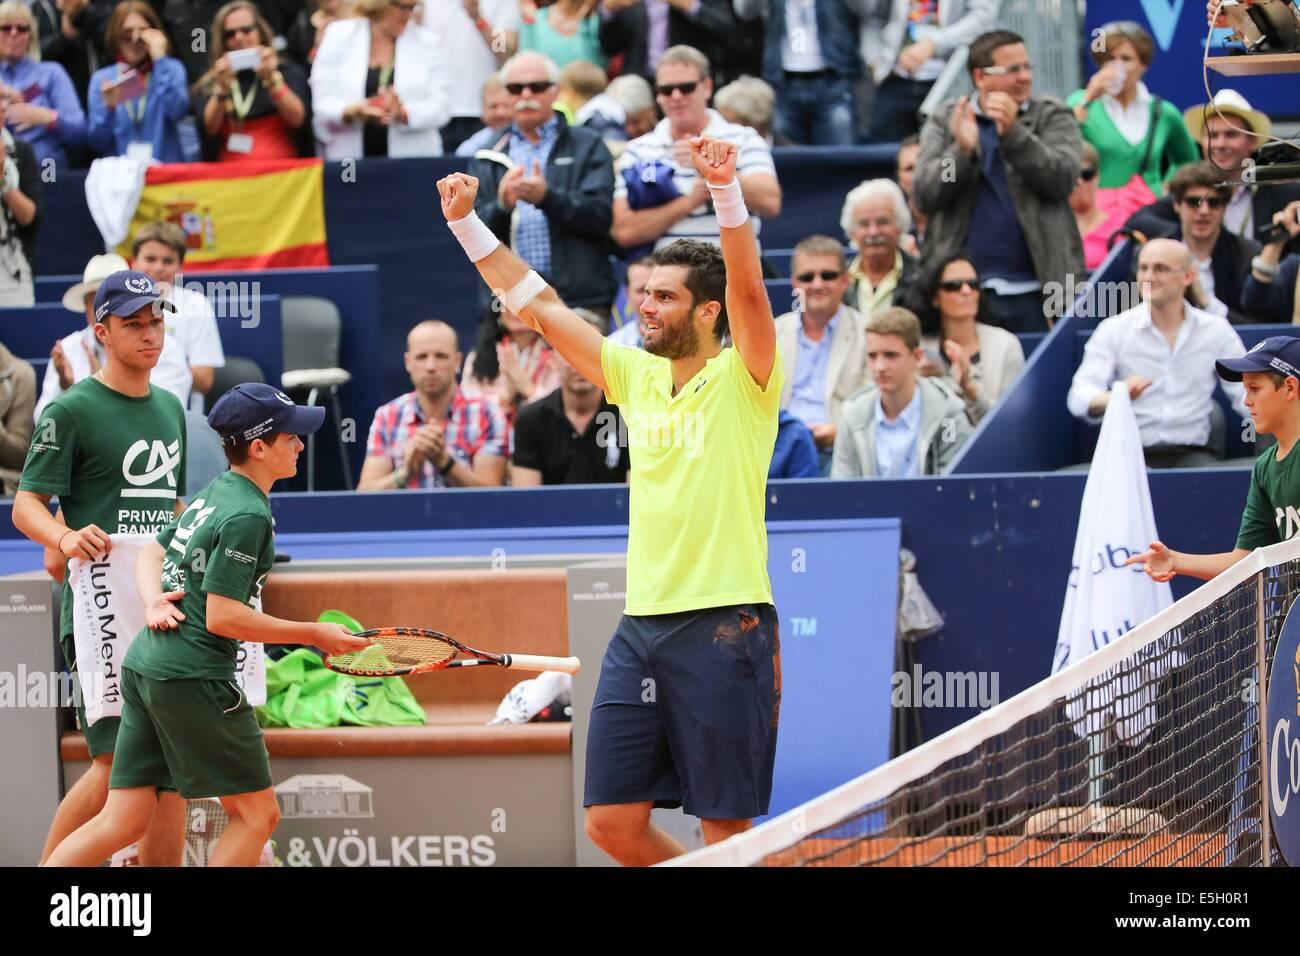 Gstadd, Switzerland. 27th July, 2014. ATP Swiss Open Mens Tennis championships. Pablo Andujar (ESP) celebrates winning - Stock Image